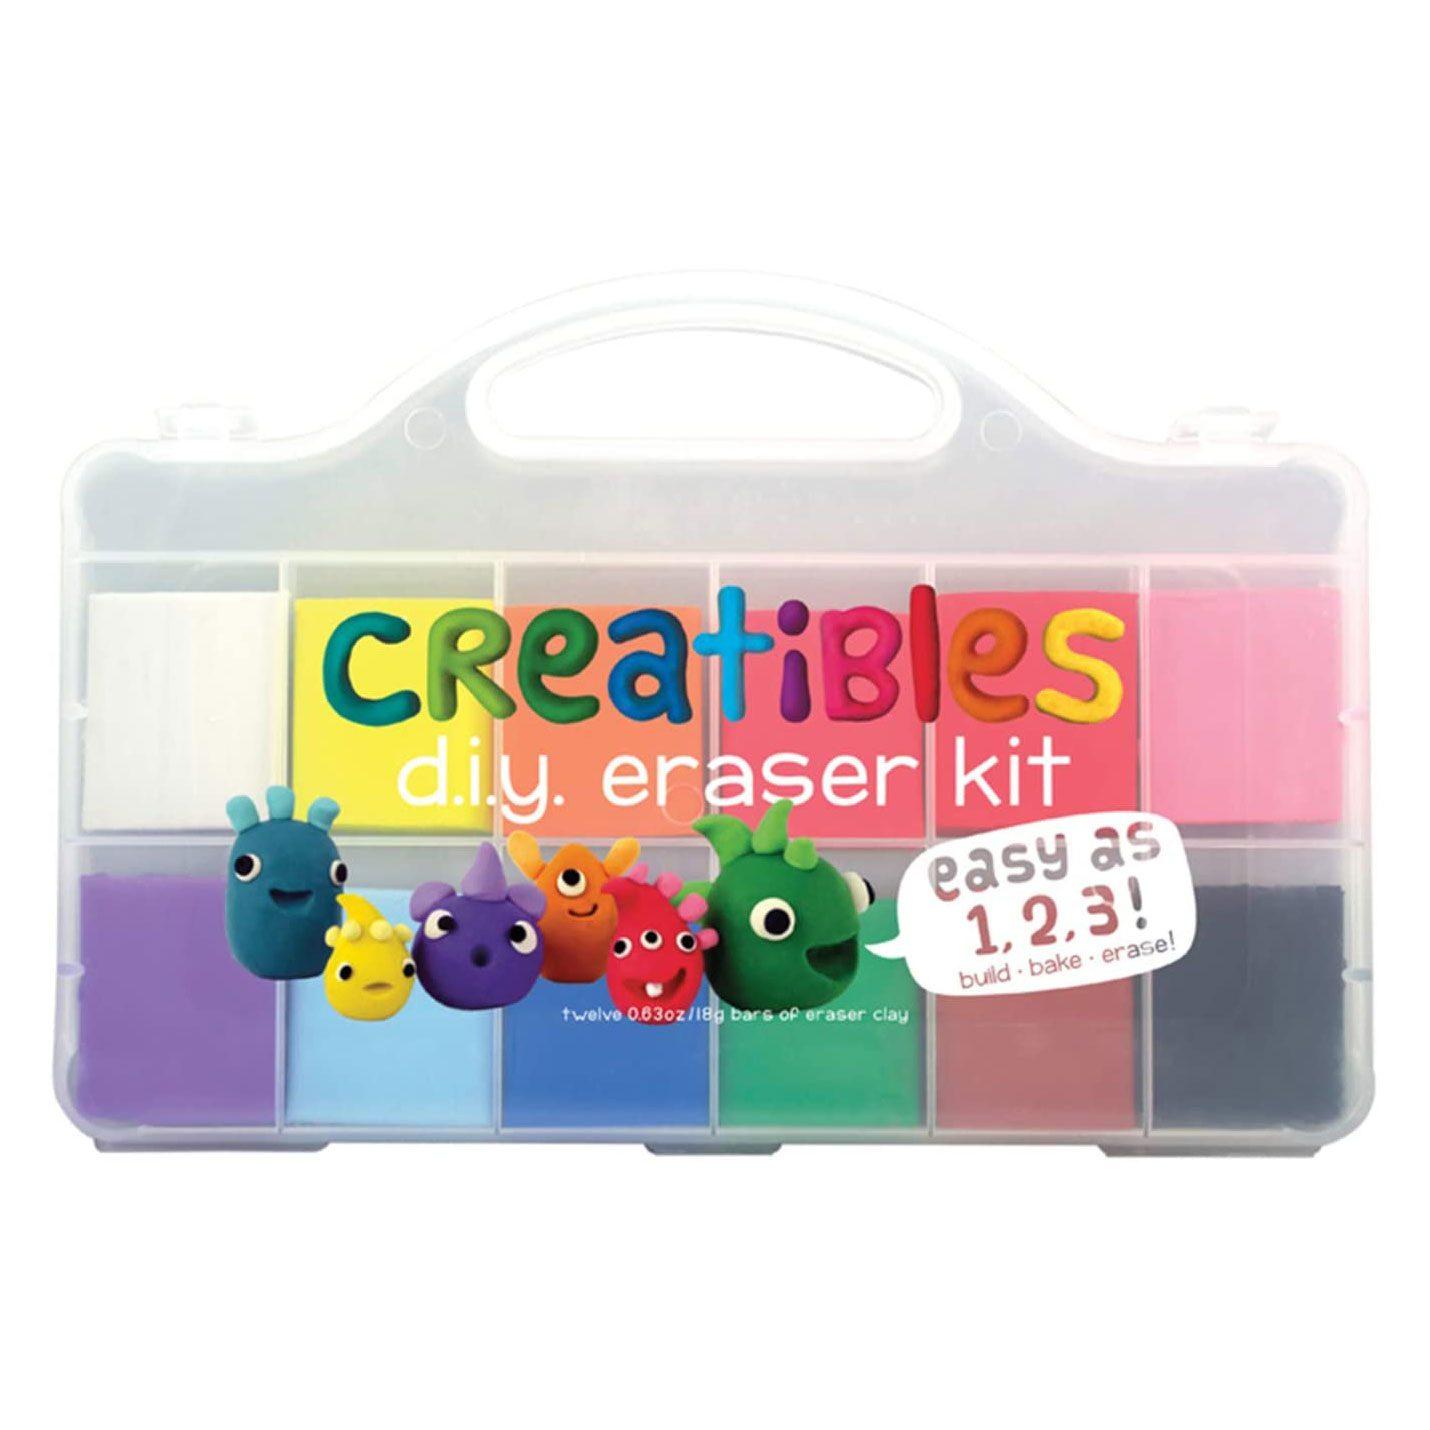 Creatibles DIY Eraser Kit